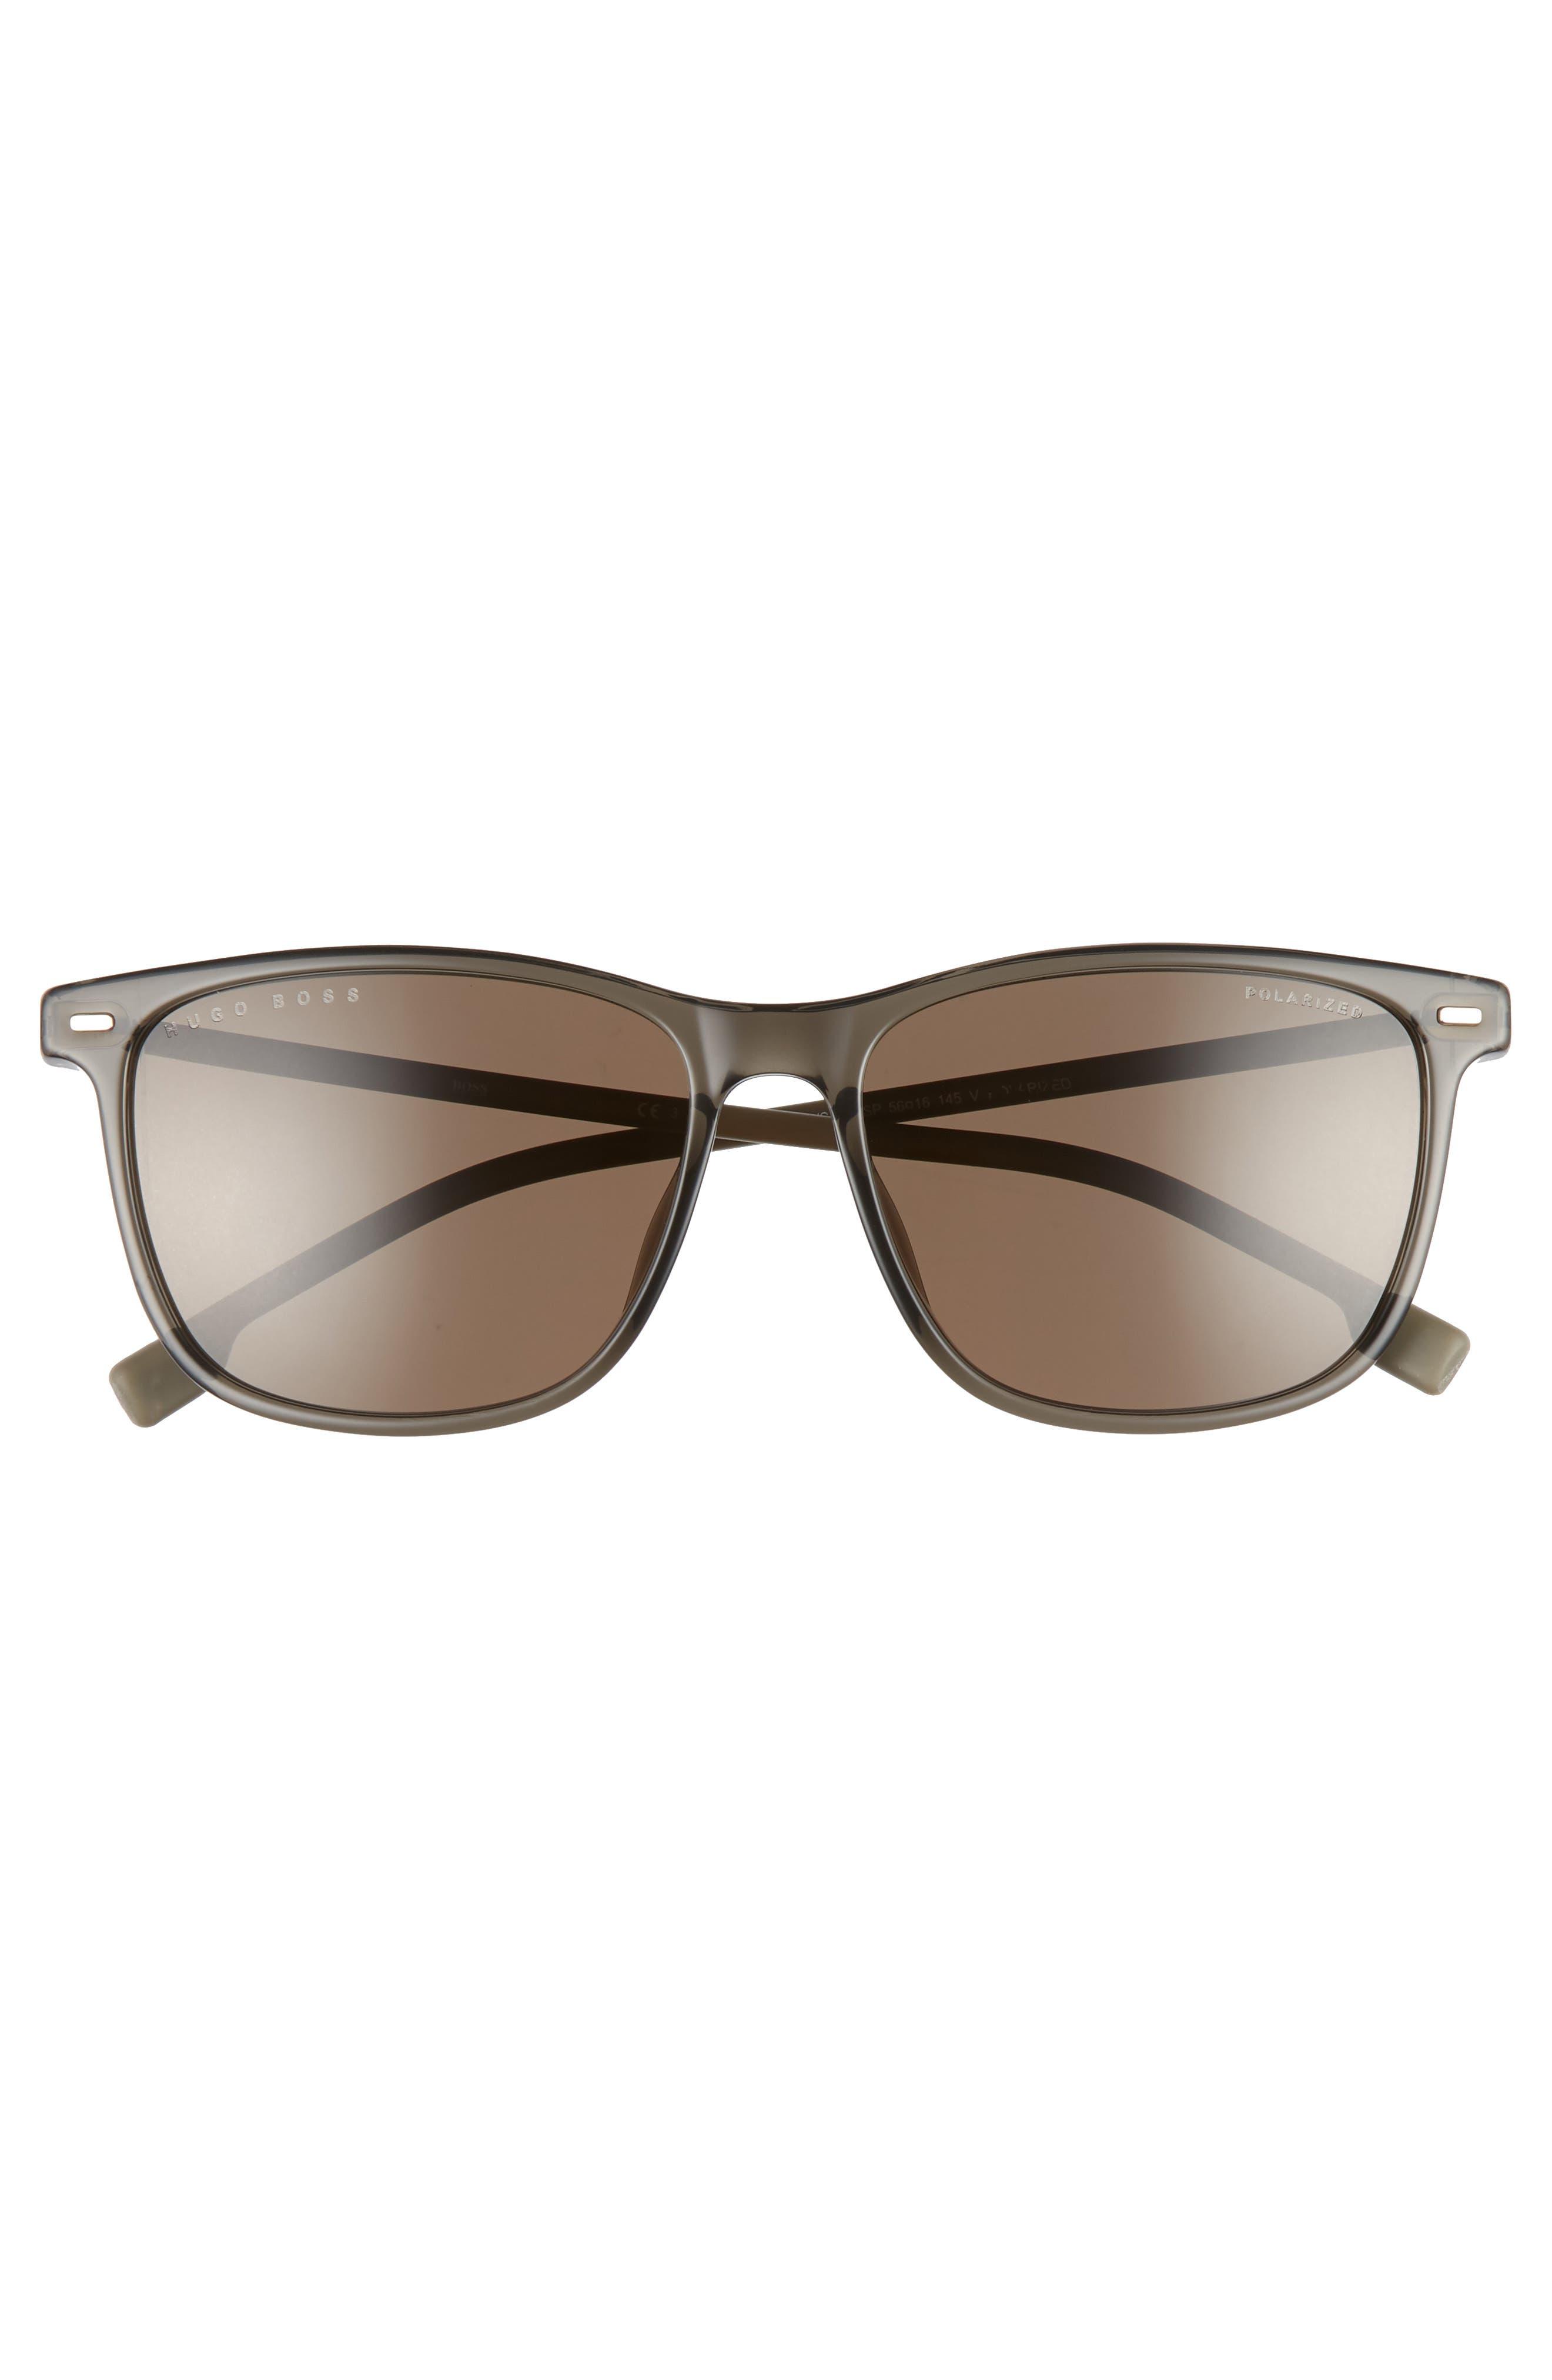 56mm Polarized Sunglasses,                             Alternate thumbnail 2, color,                             GREY BEIGE